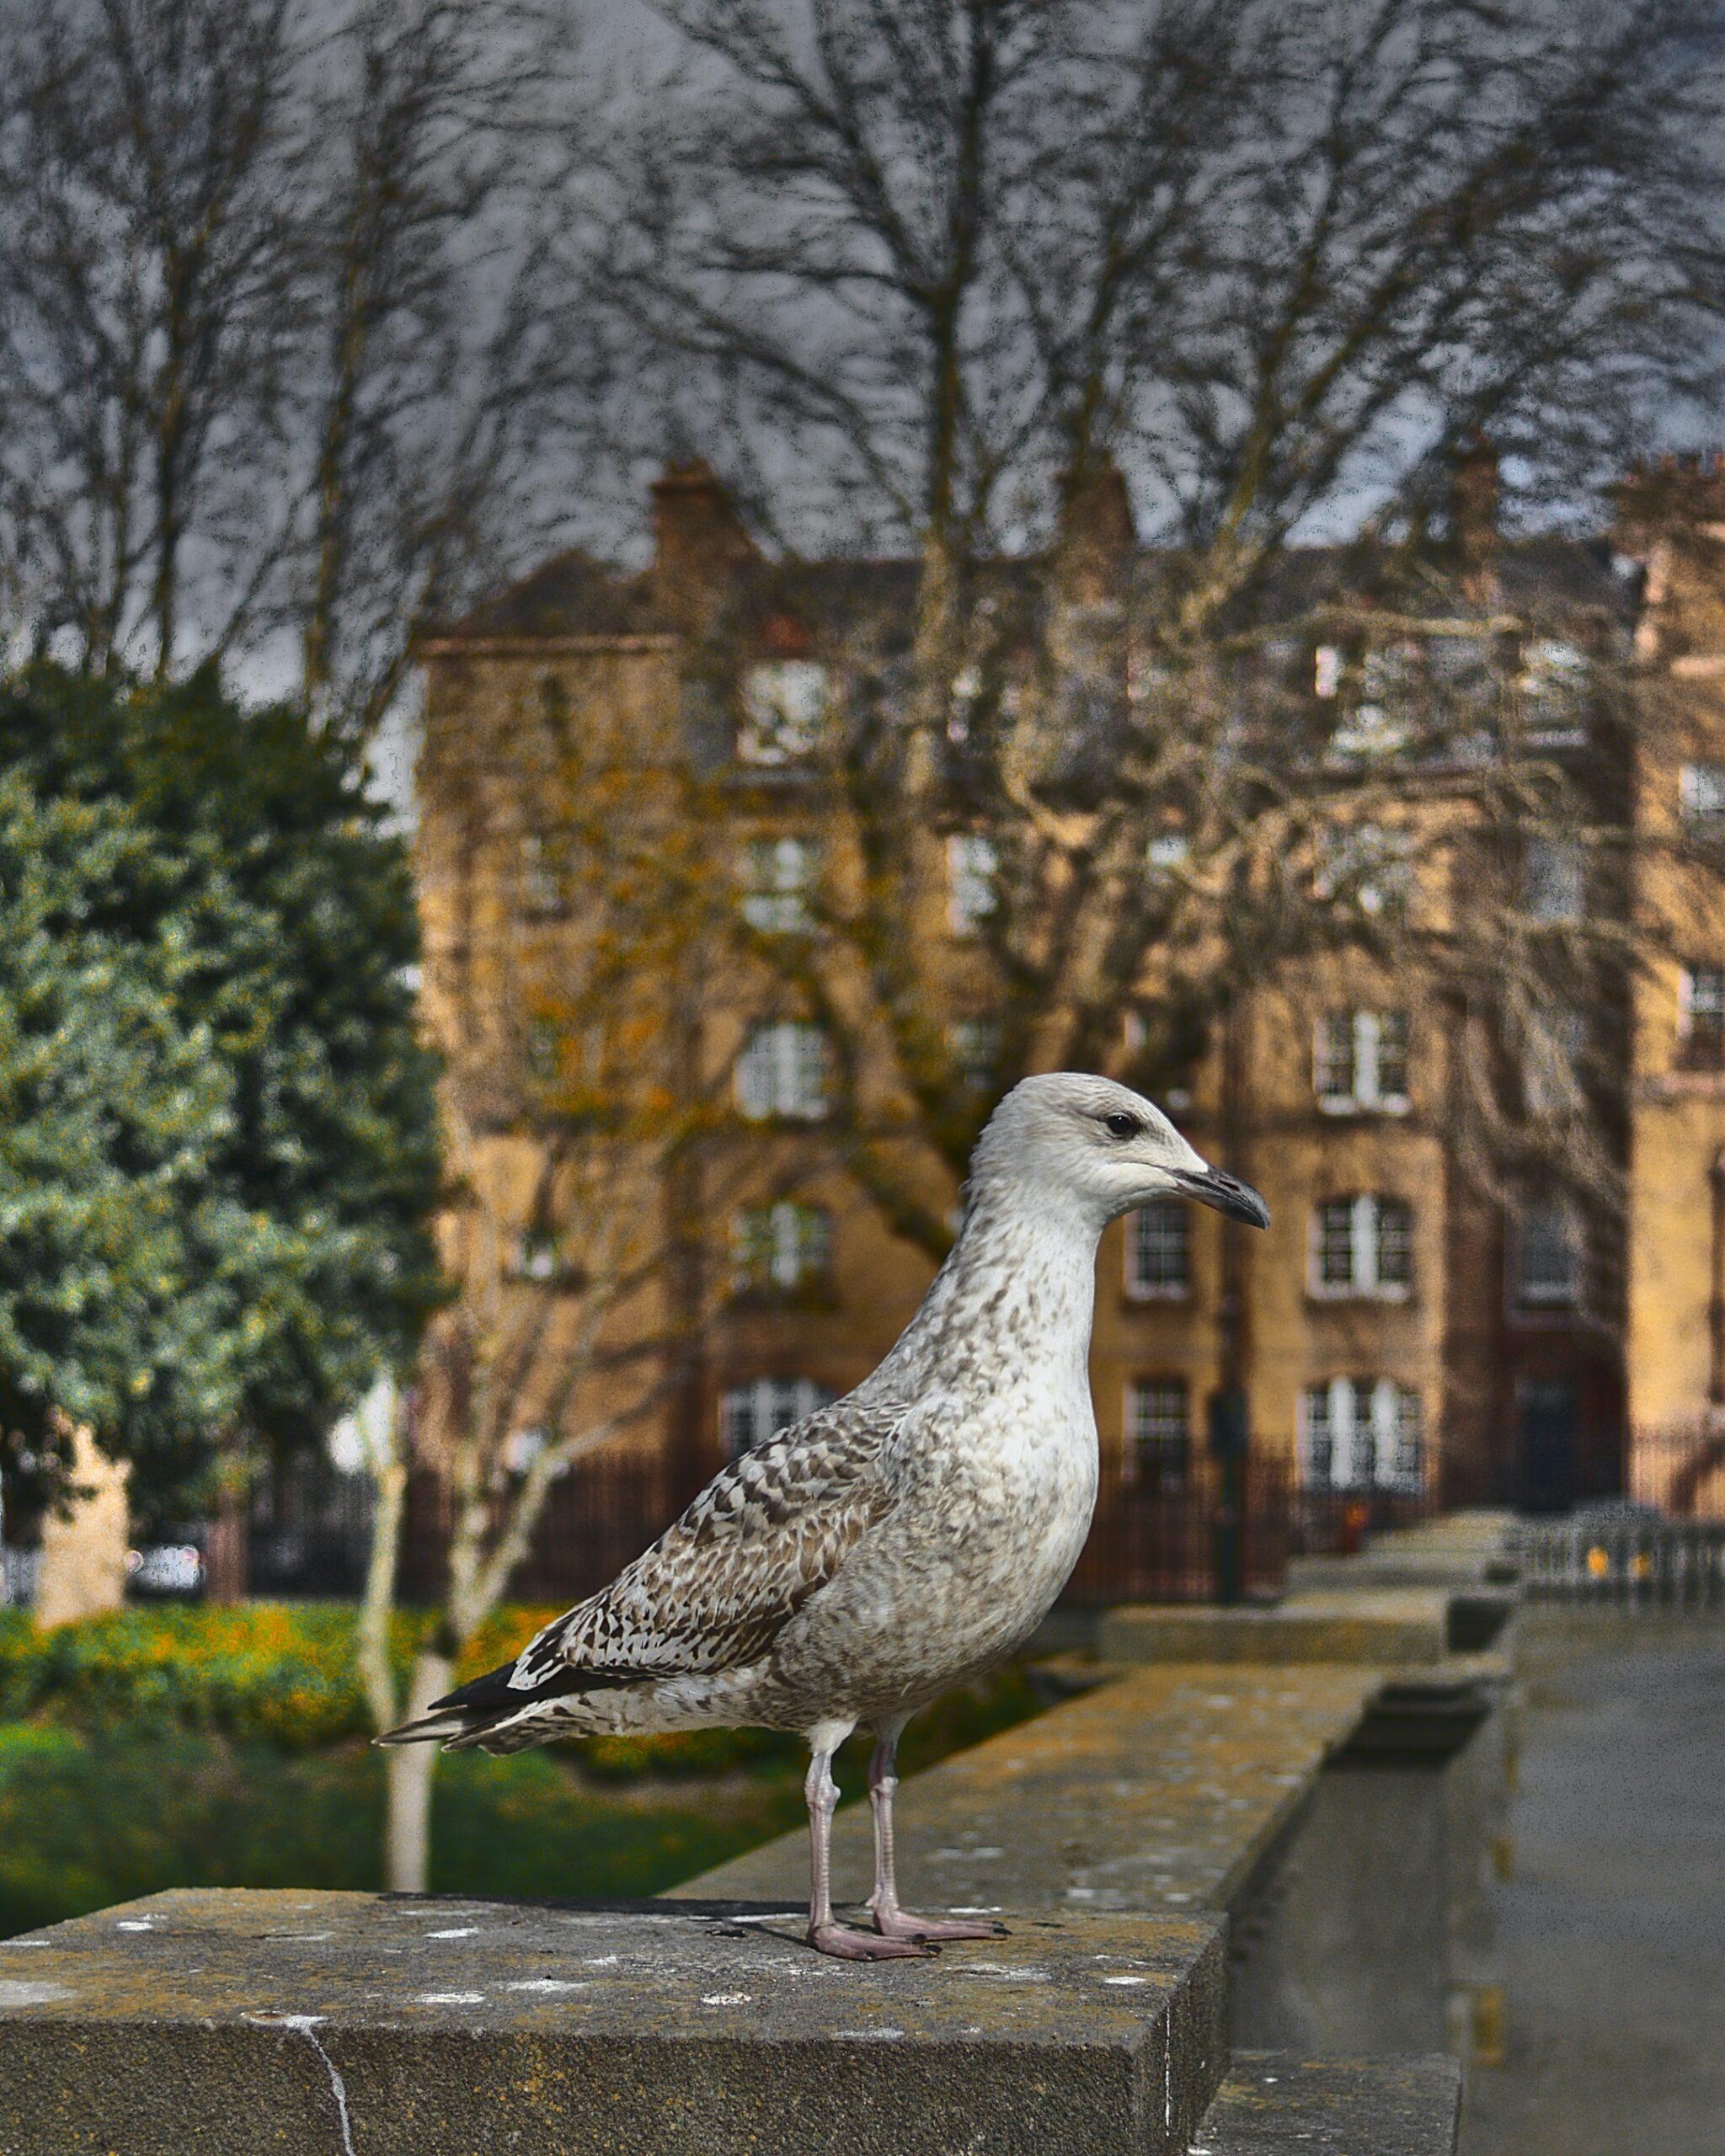 jonas-stolle-Pigeon up close-unsplash